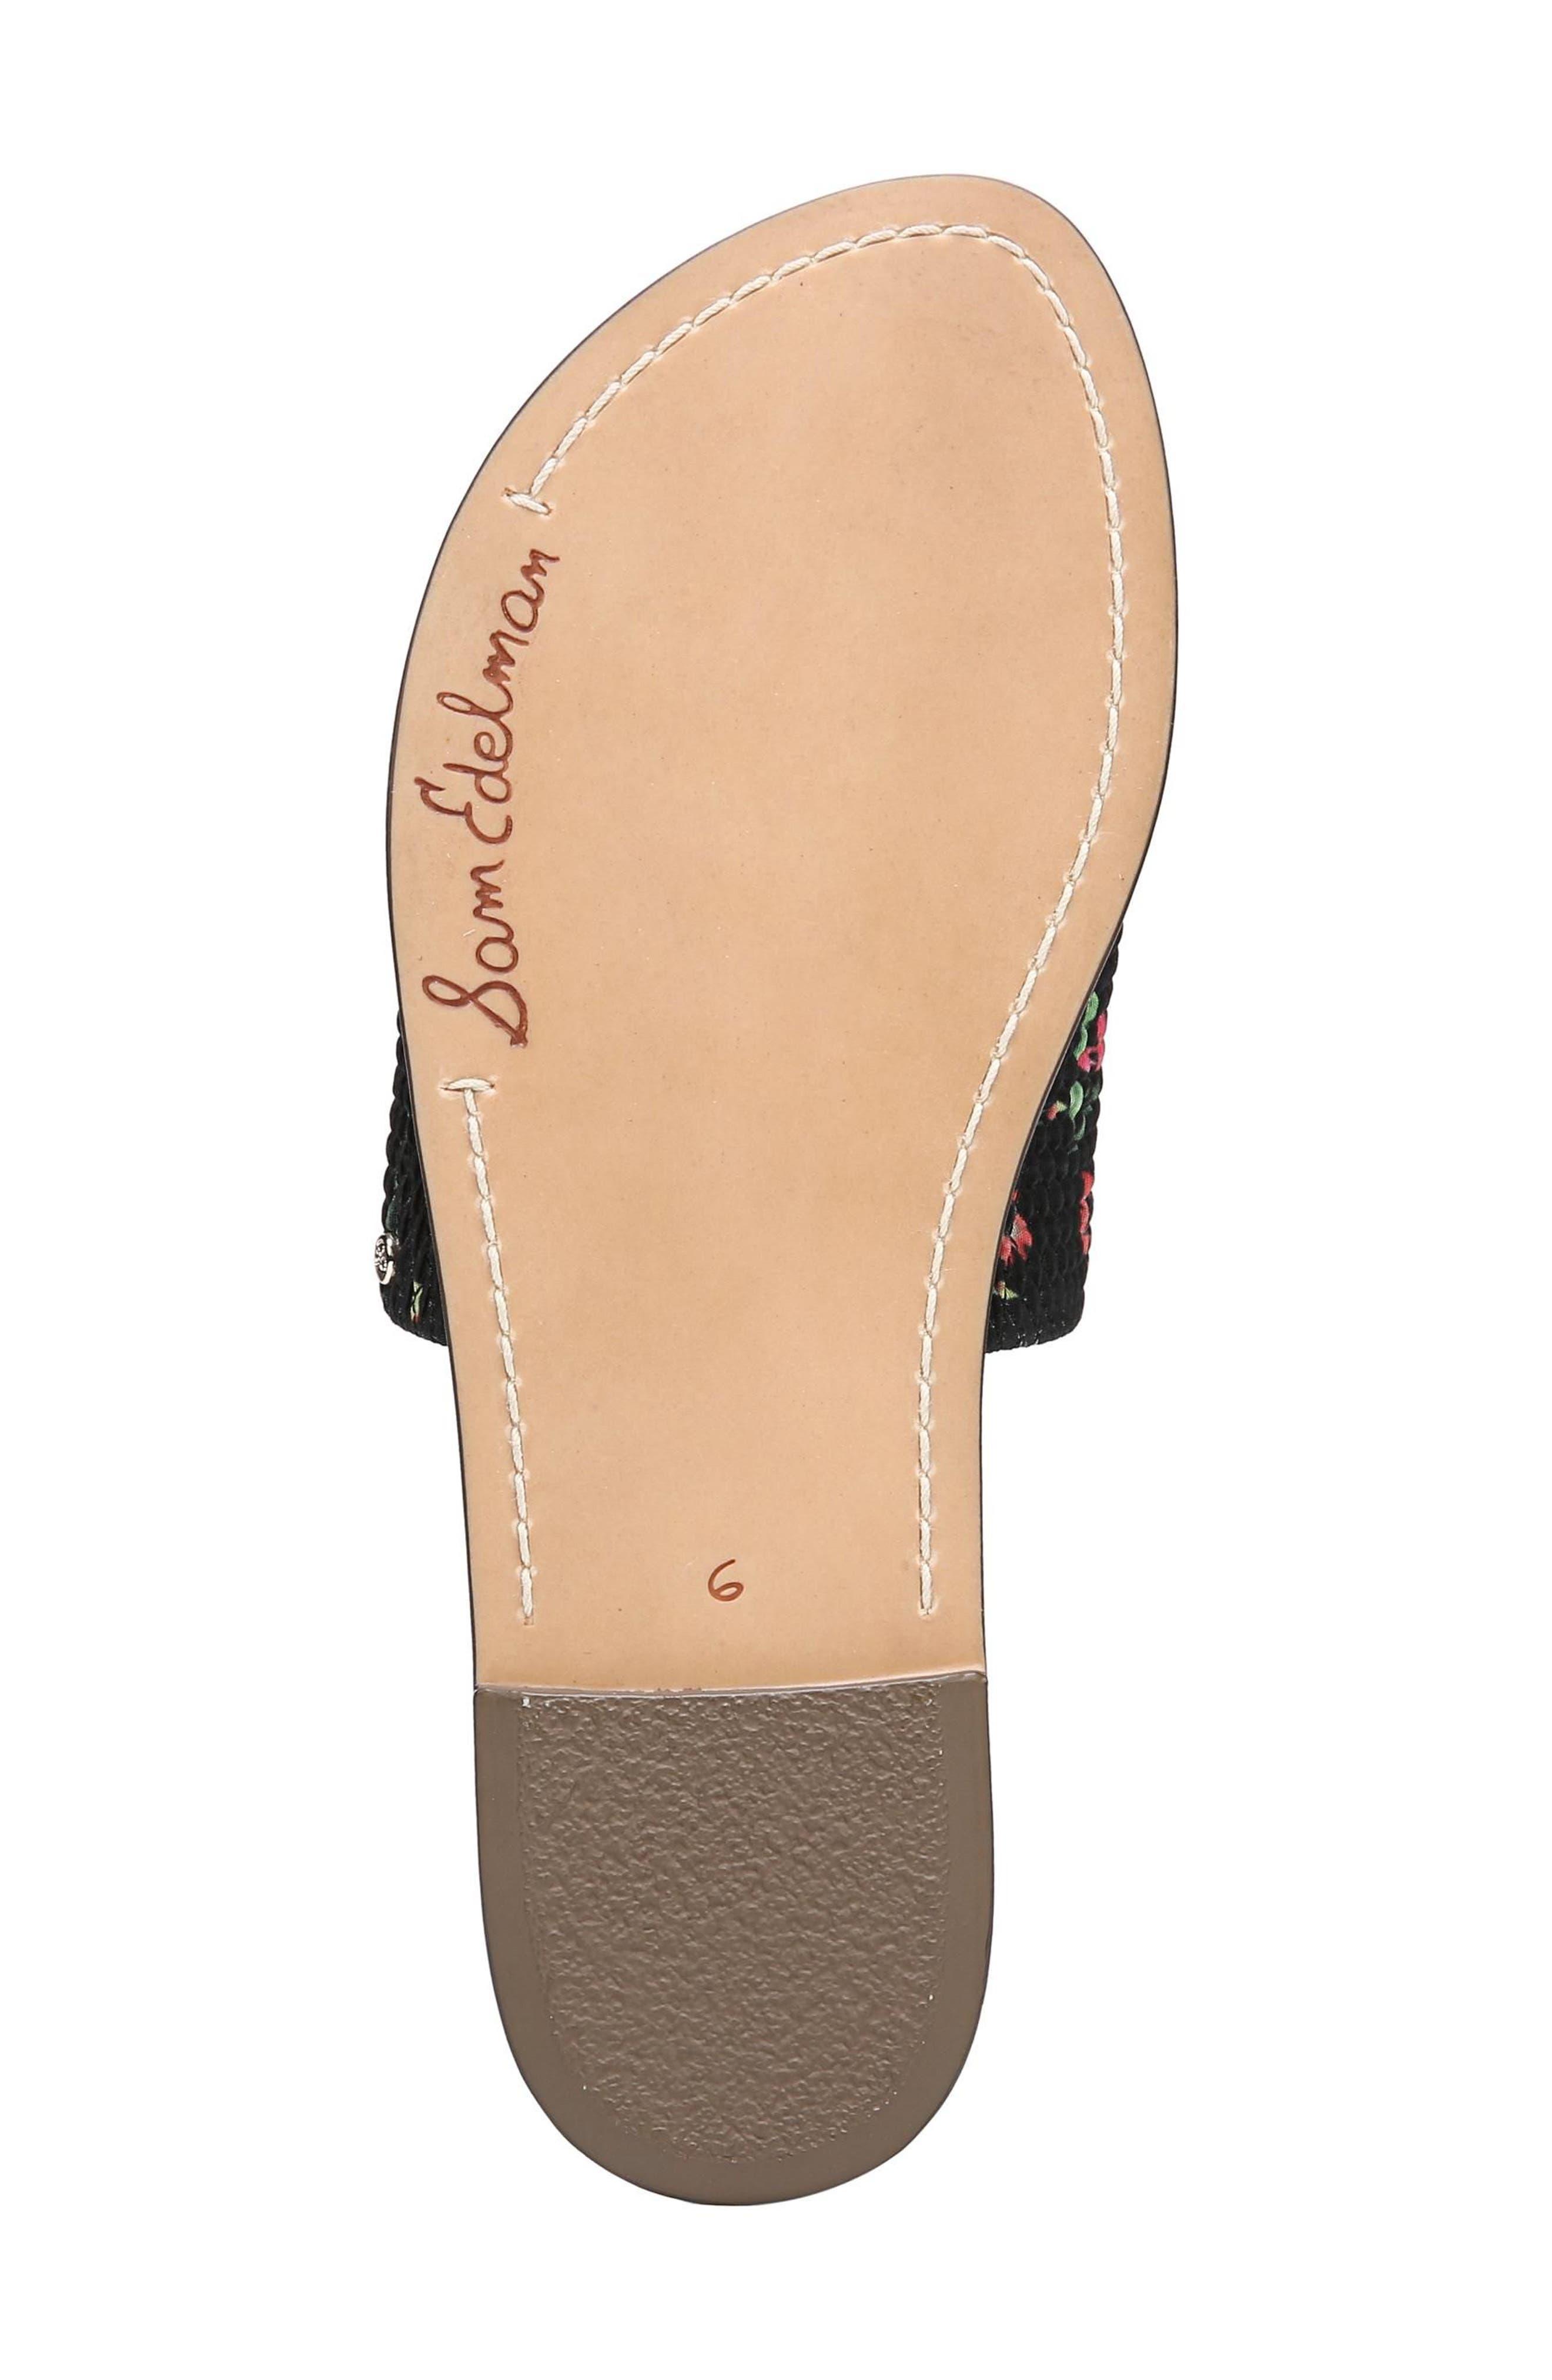 Gio Slide Sandal,                             Alternate thumbnail 6, color,                             BLACK FLORAL PRINT FABRIC